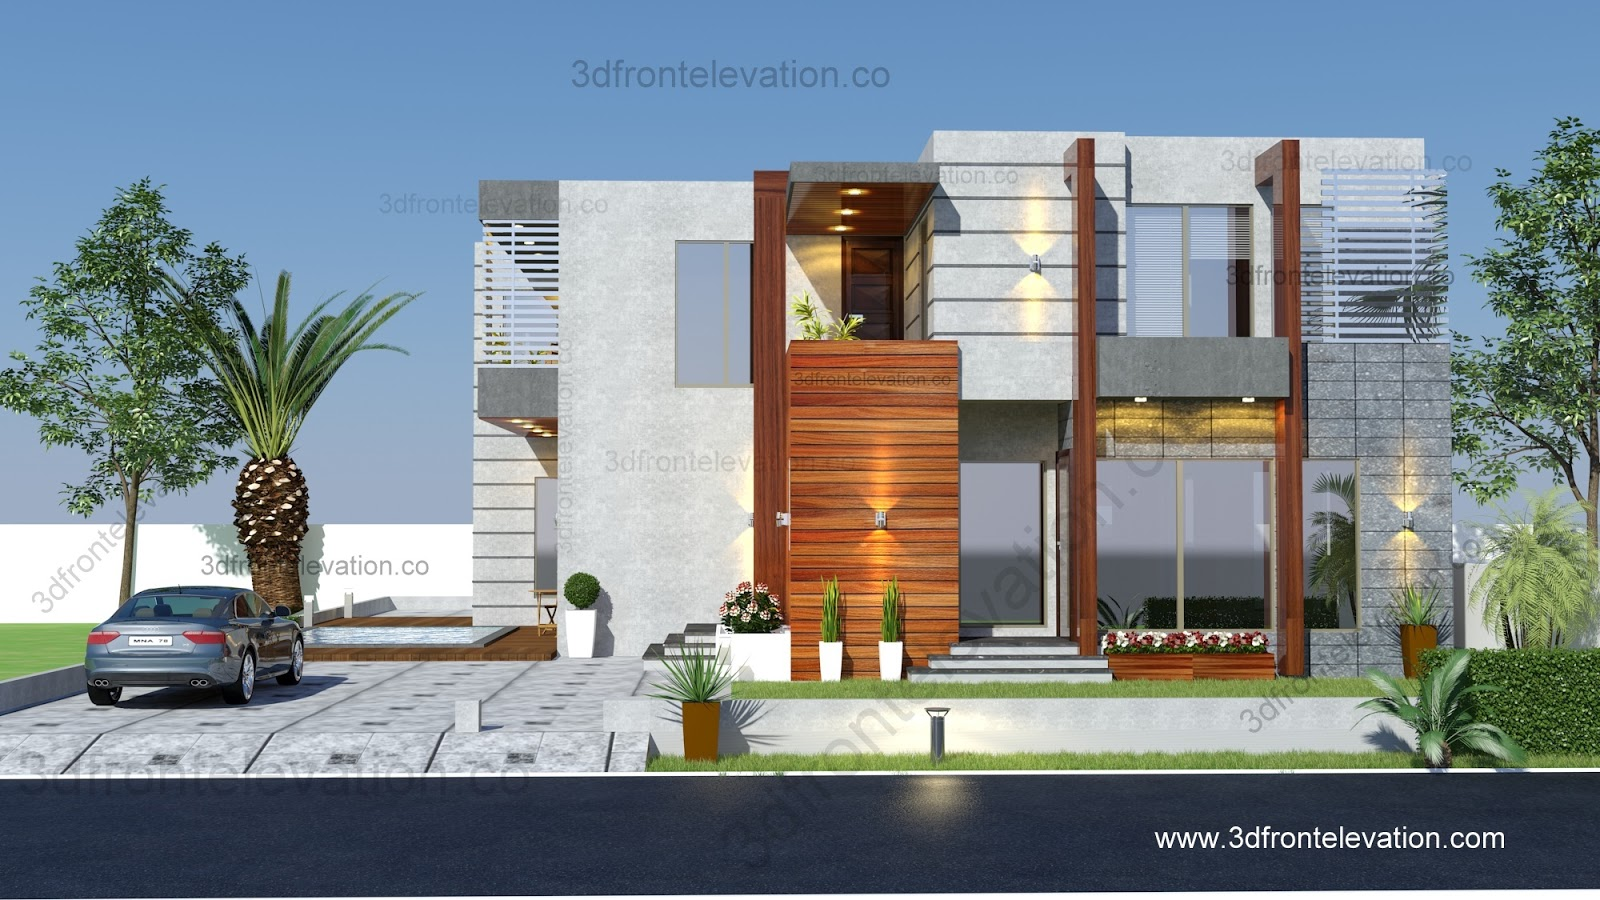 3d front elevationcom 10 best housing designs of 2016 for modern farmhouse elevation - Farmhouse Elevations